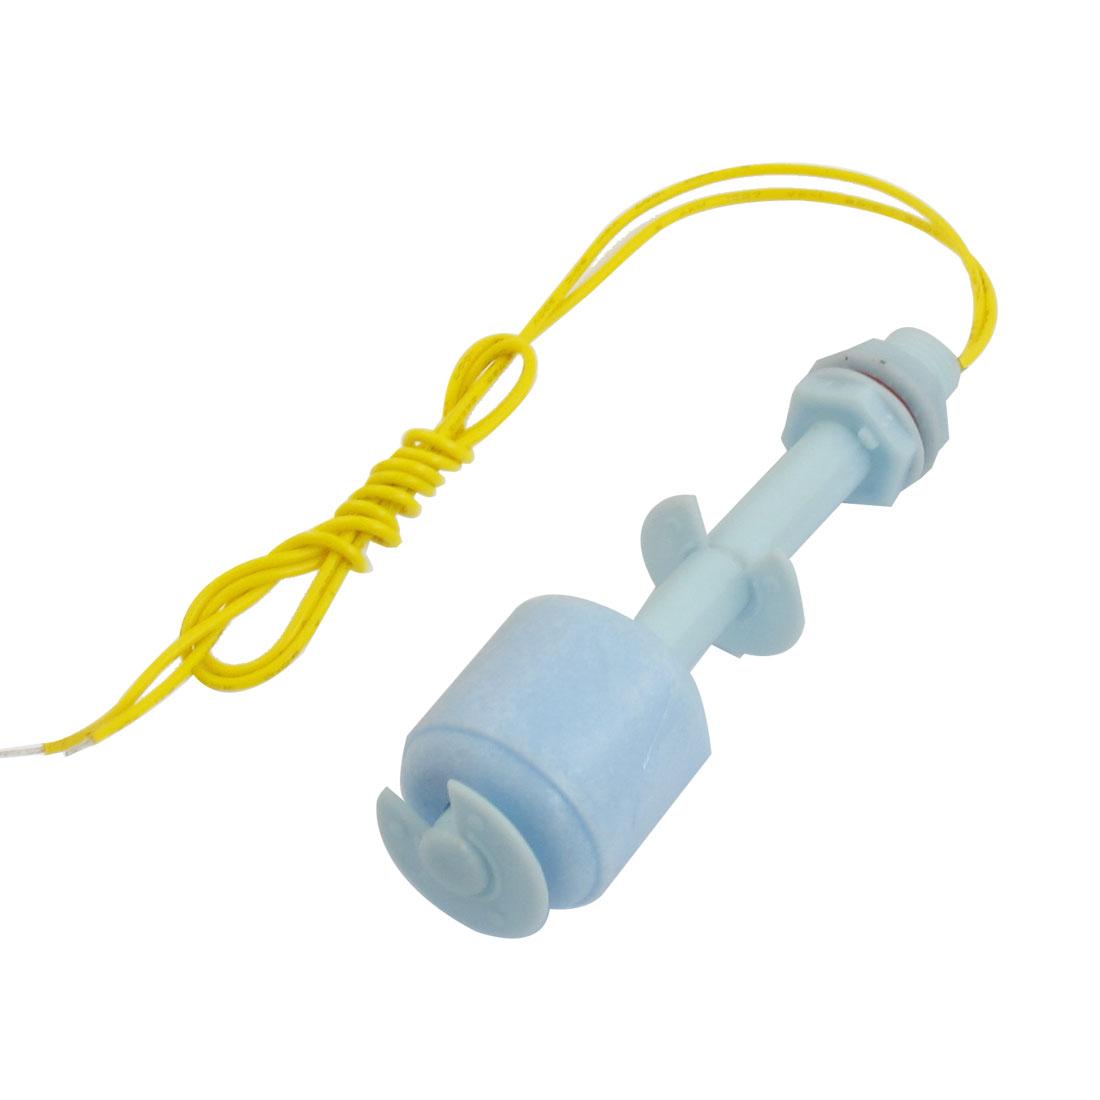 ZP7510-P SPST Blue Tank Pool Liquid Water Level Sensor Vertical Float Switch